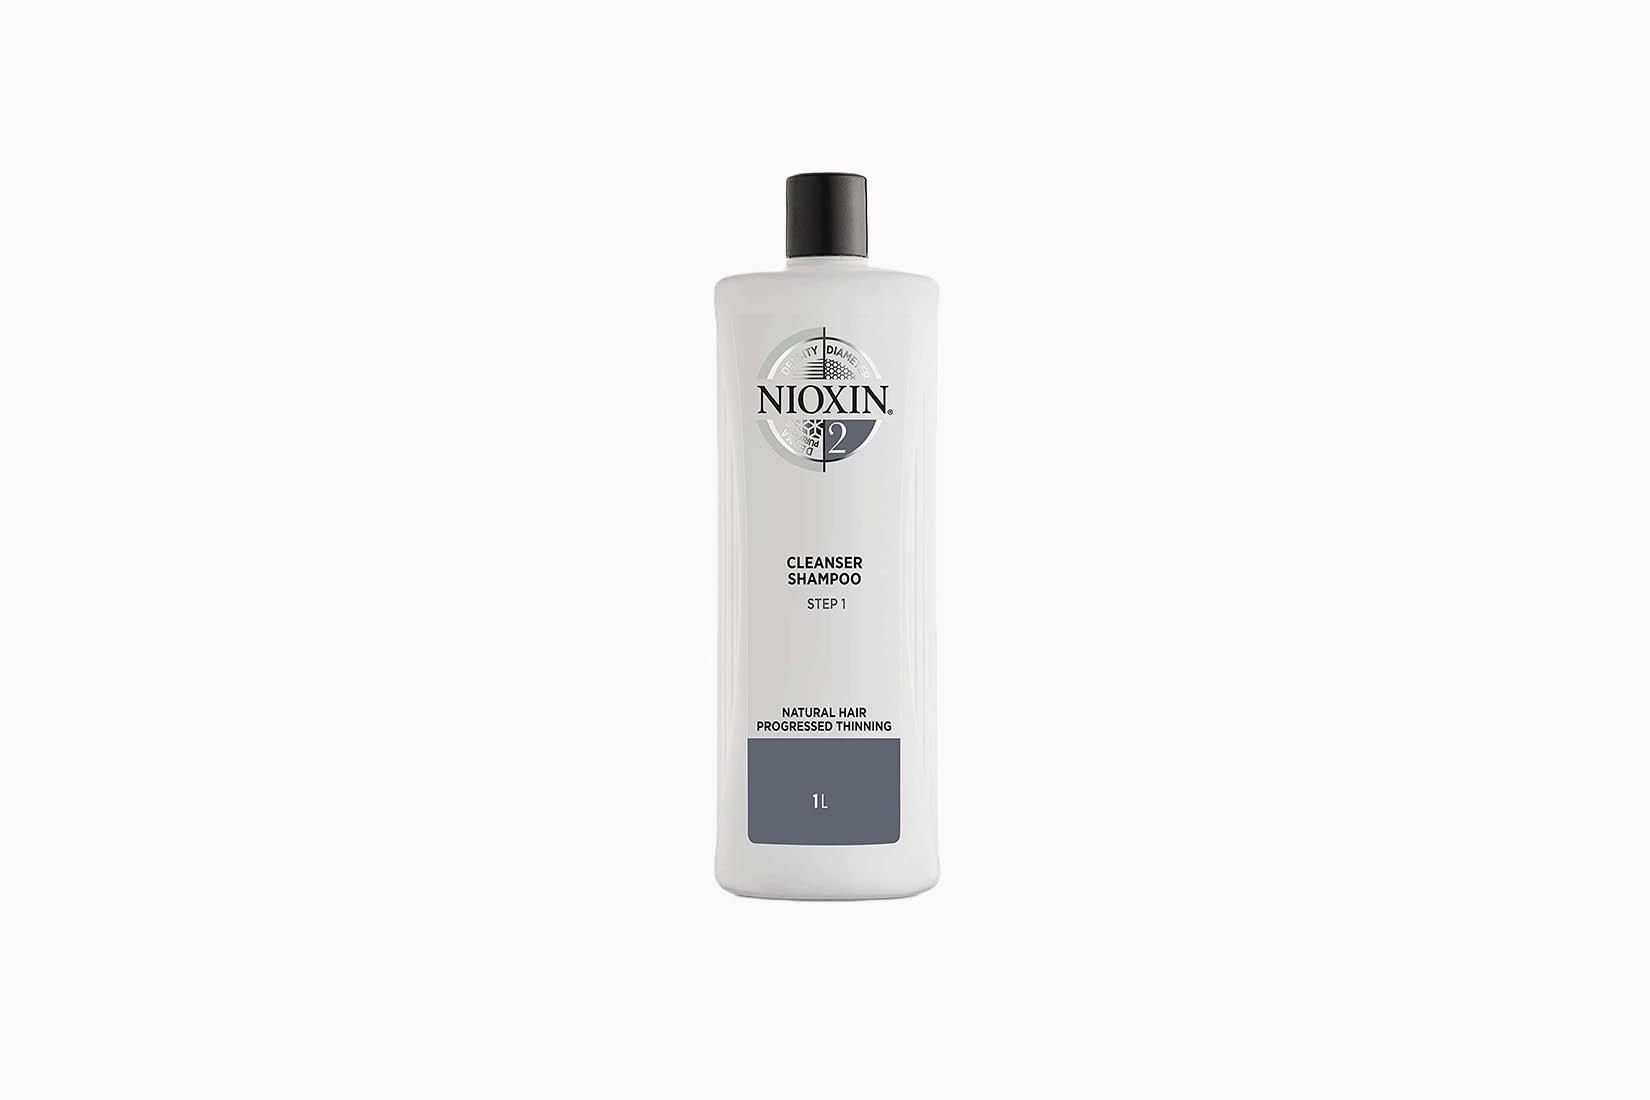 Best Hair Pura Dor Shampoo Men Nioxin Review - Luxe Digital